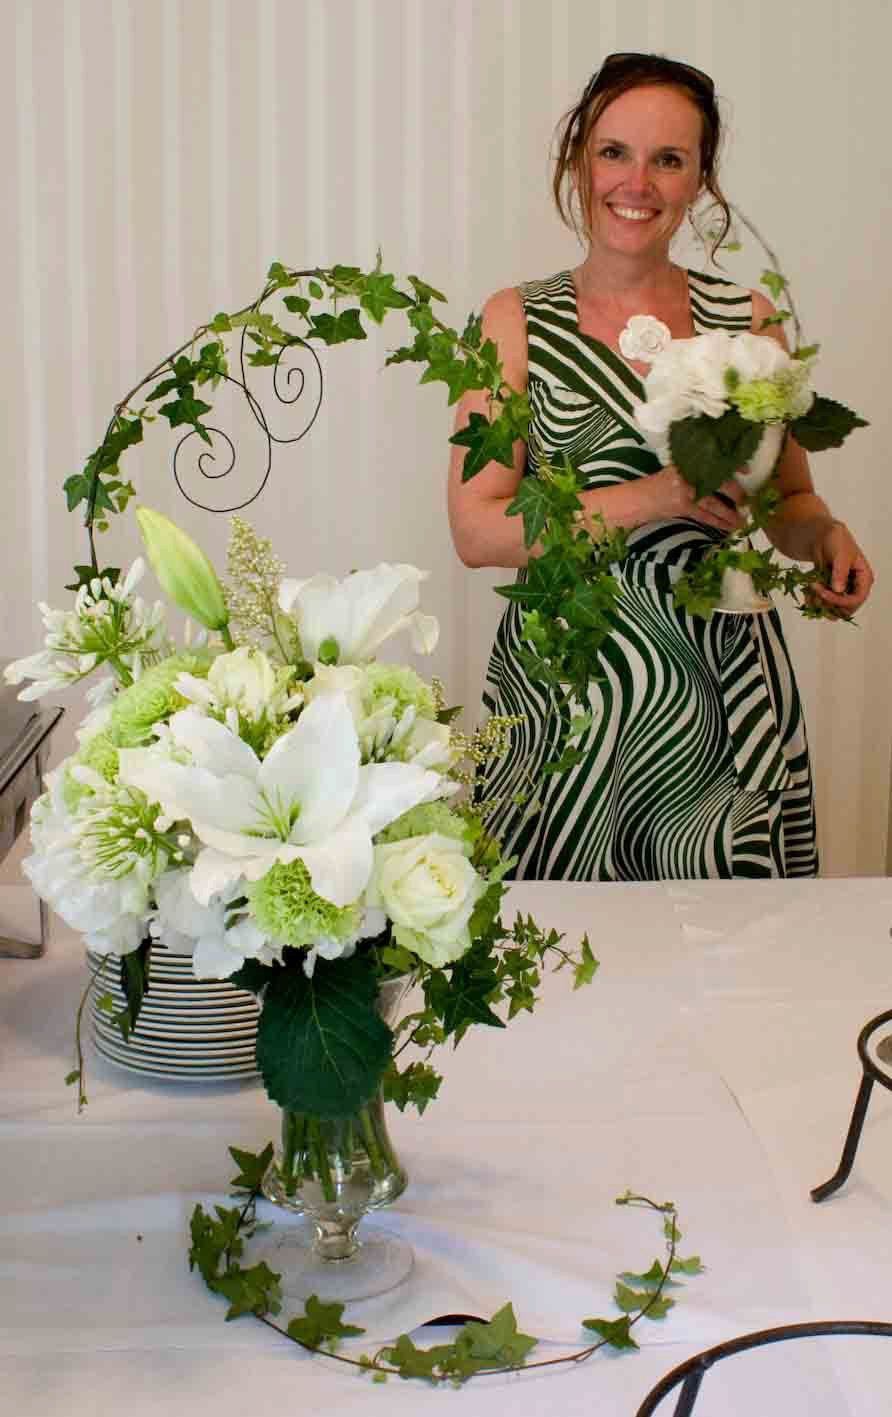 Wedding decorations for friend's wedding. Design by Elina Mäntylä (in the photo), Valona Florana www.facebook.com/Valona.design